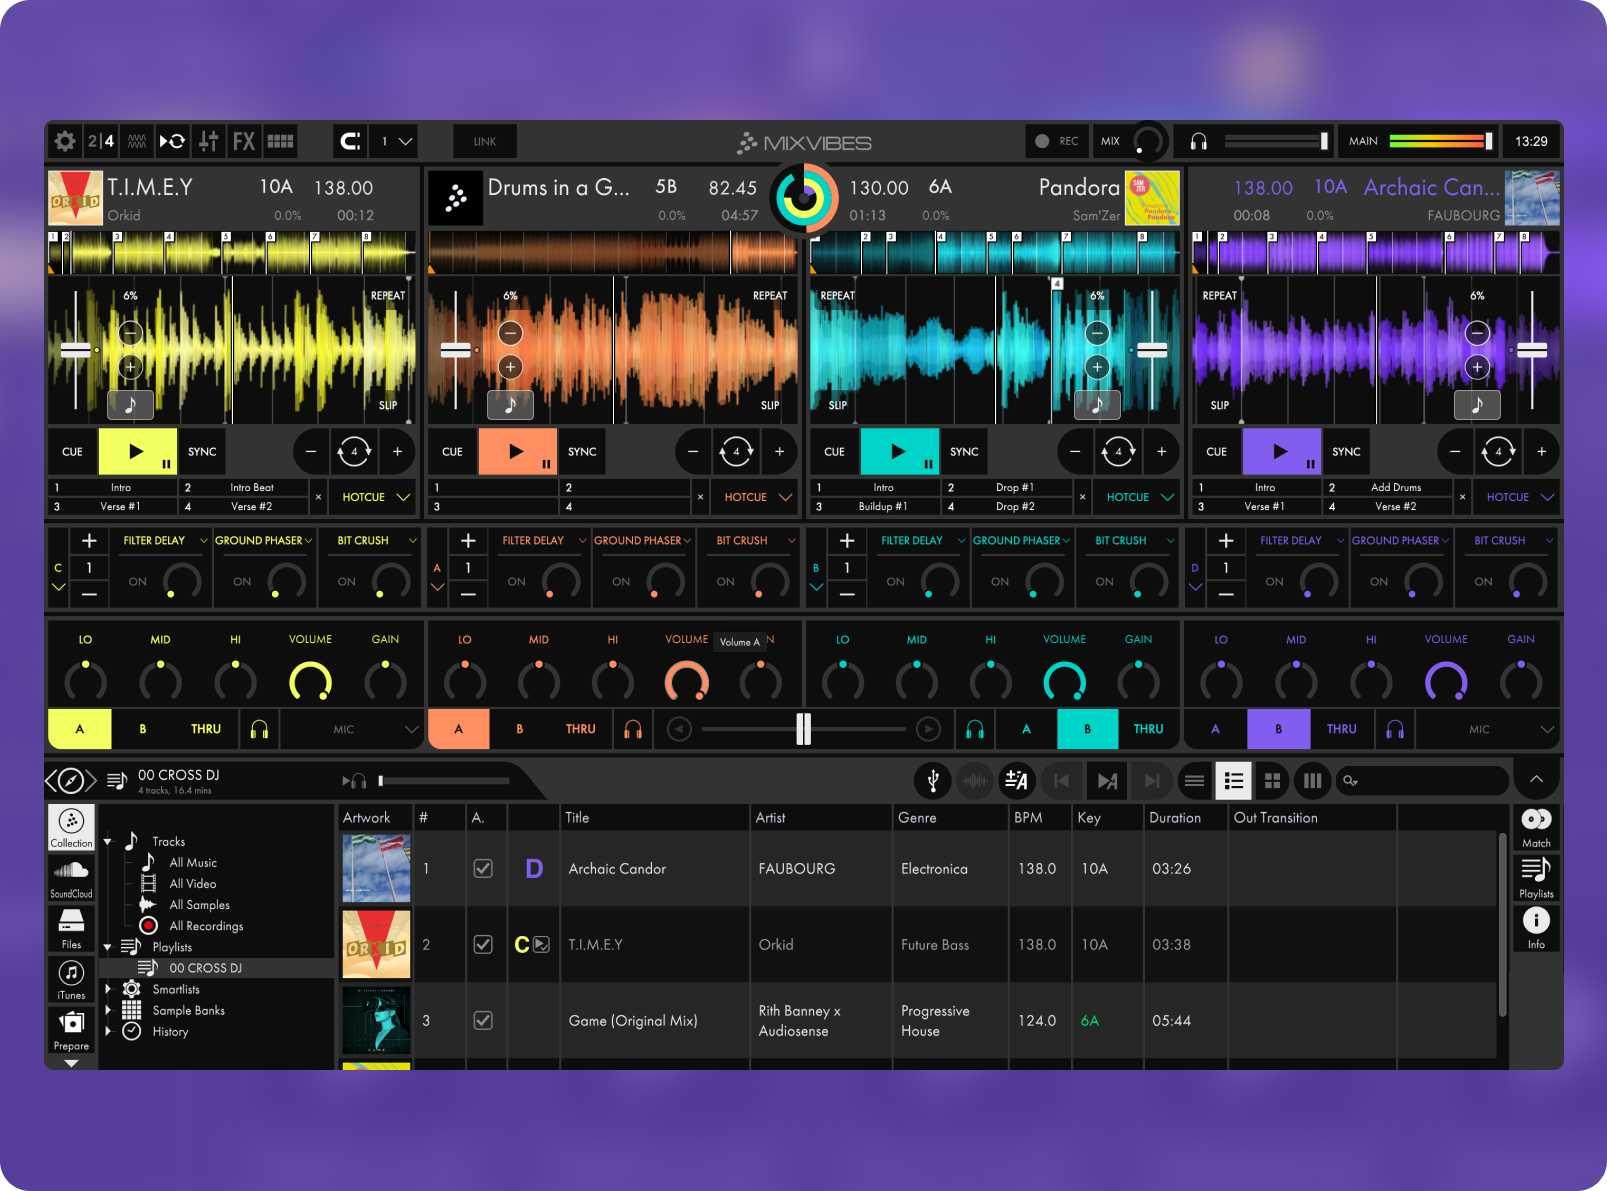 Cross DJ's 4 decks views and effects settings